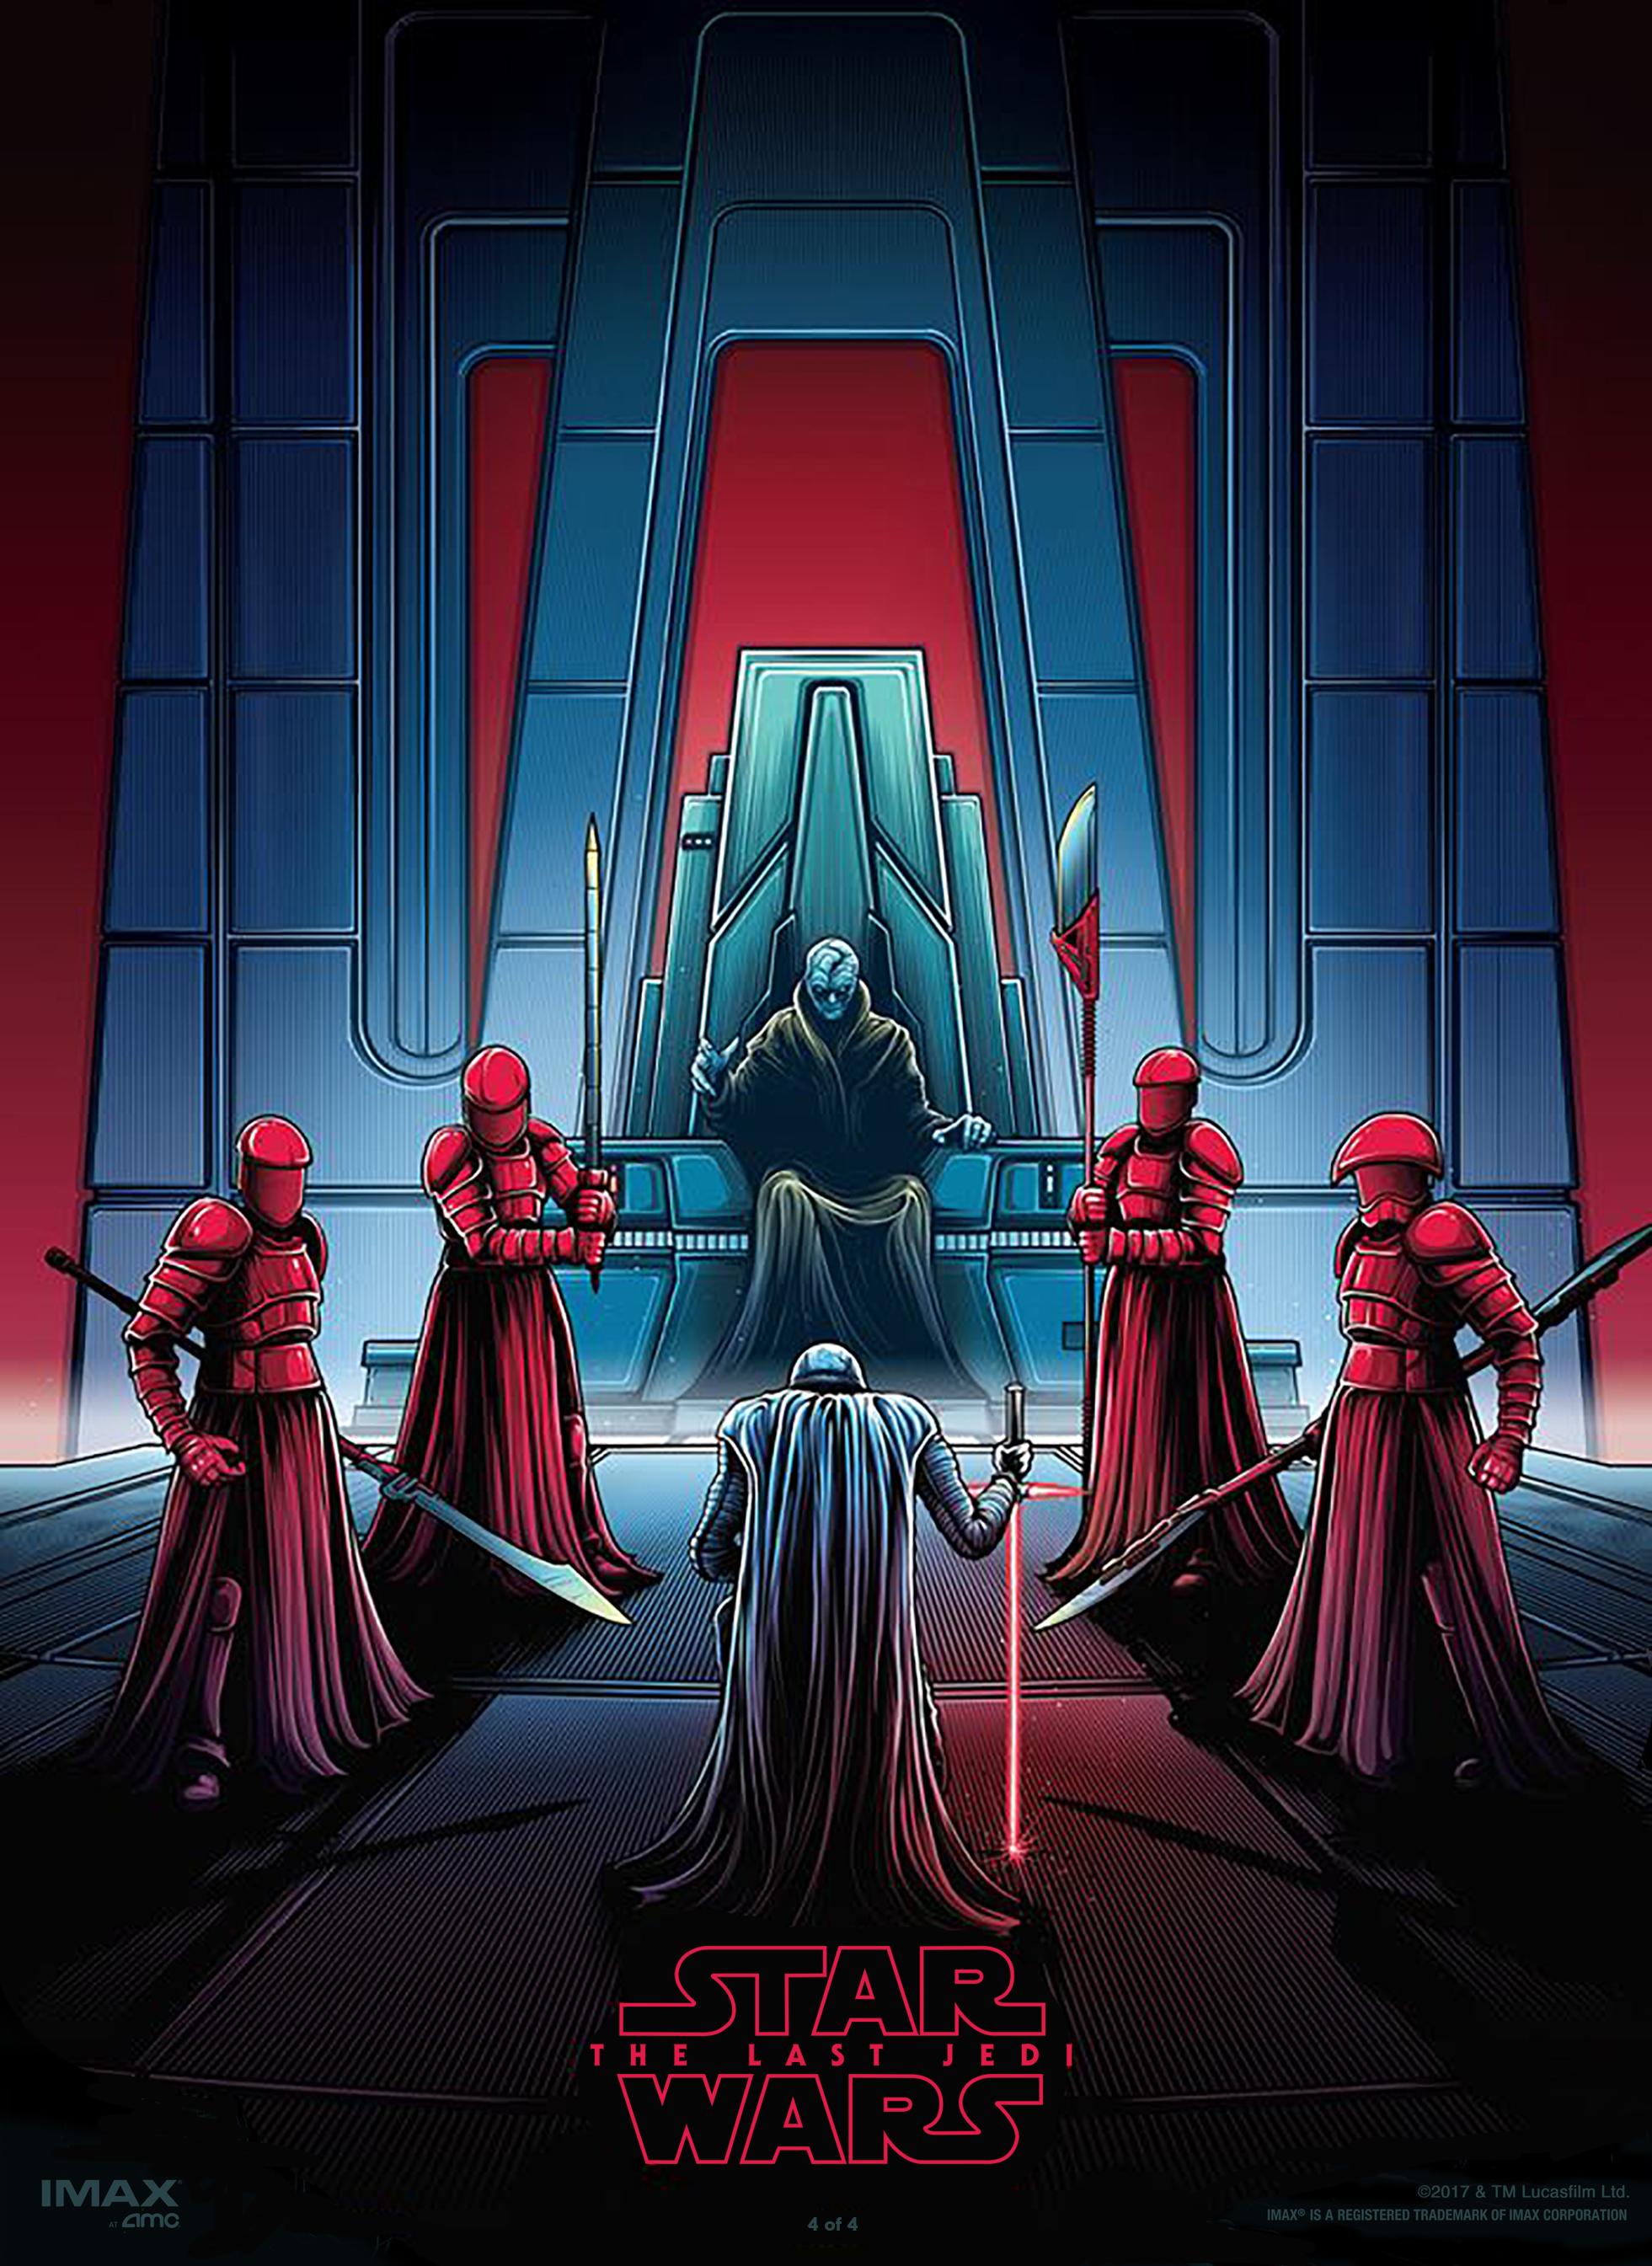 The Last Jedi Dan Mumford Imax Posters 4 Of Kylo Ren And Snoke With Praetorian Guard